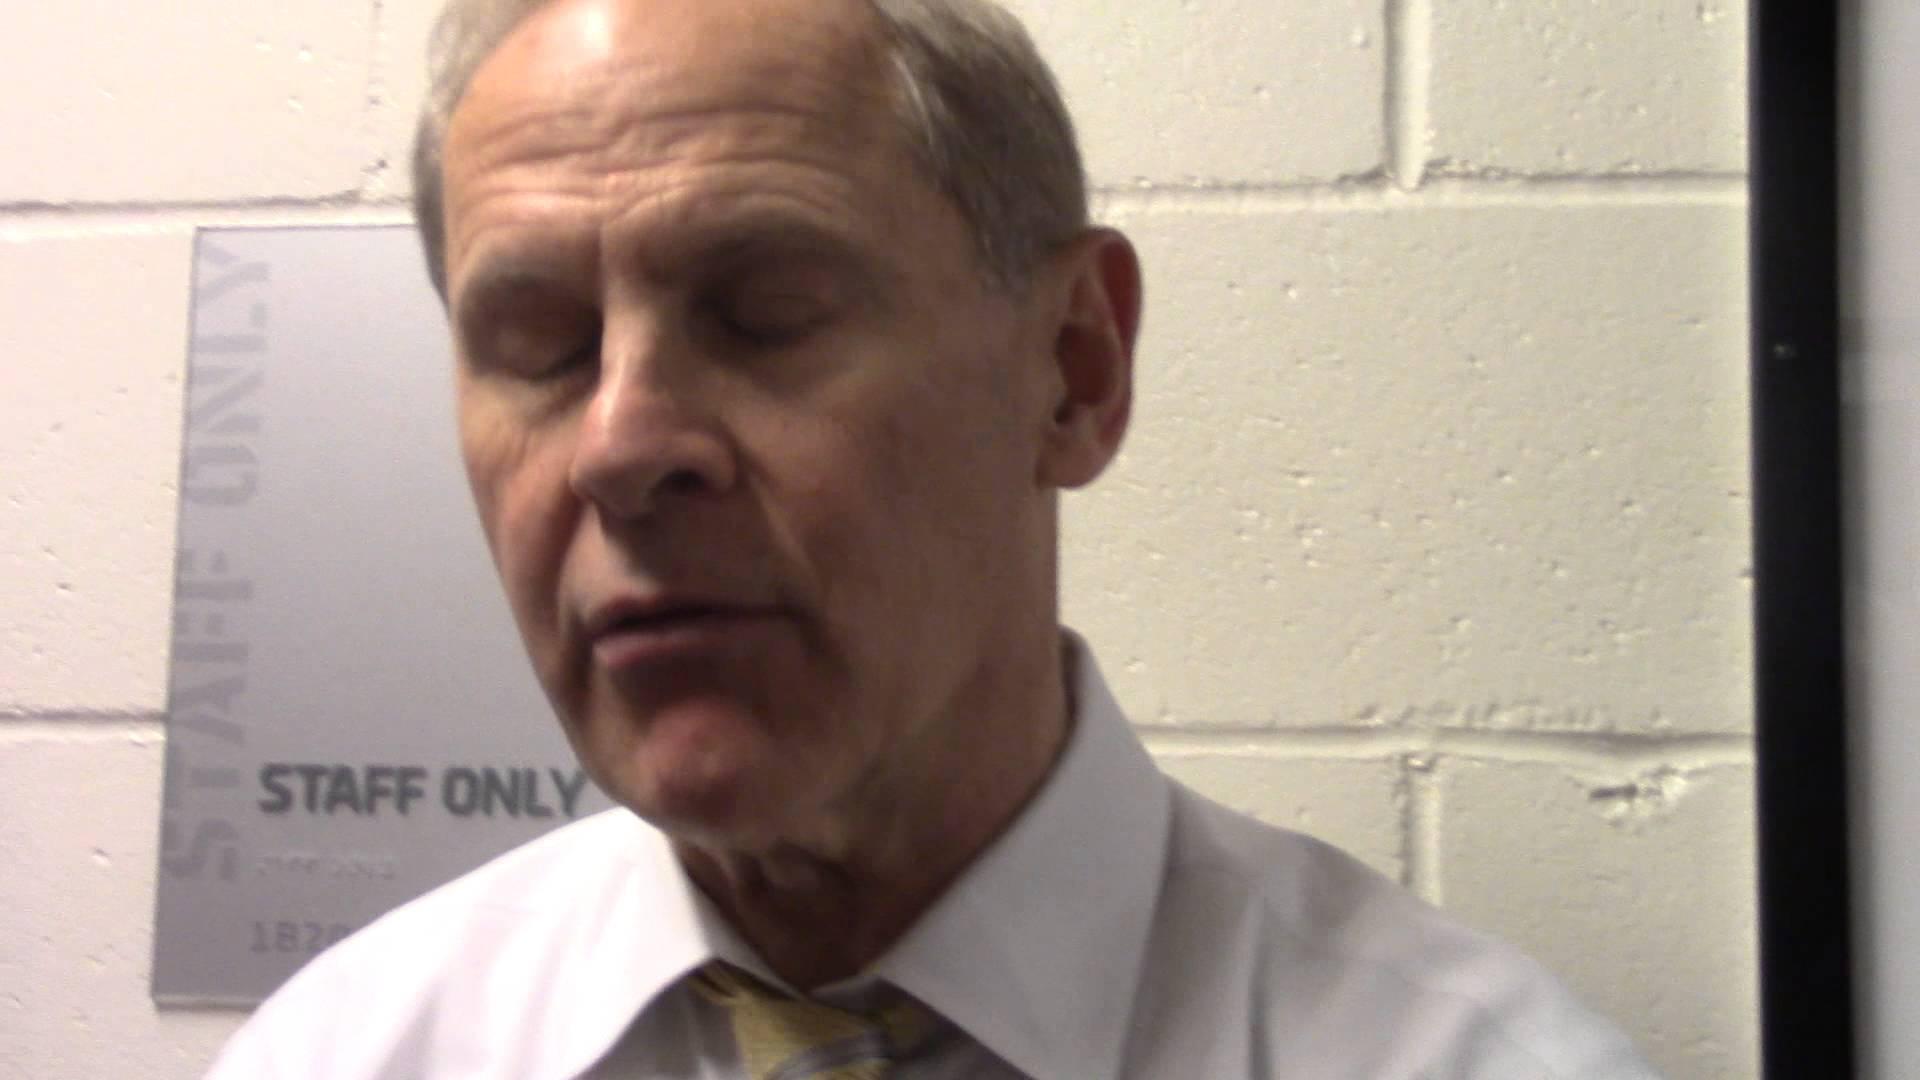 John-Beilein-discusses-Notre-Dame-loss-season-ending